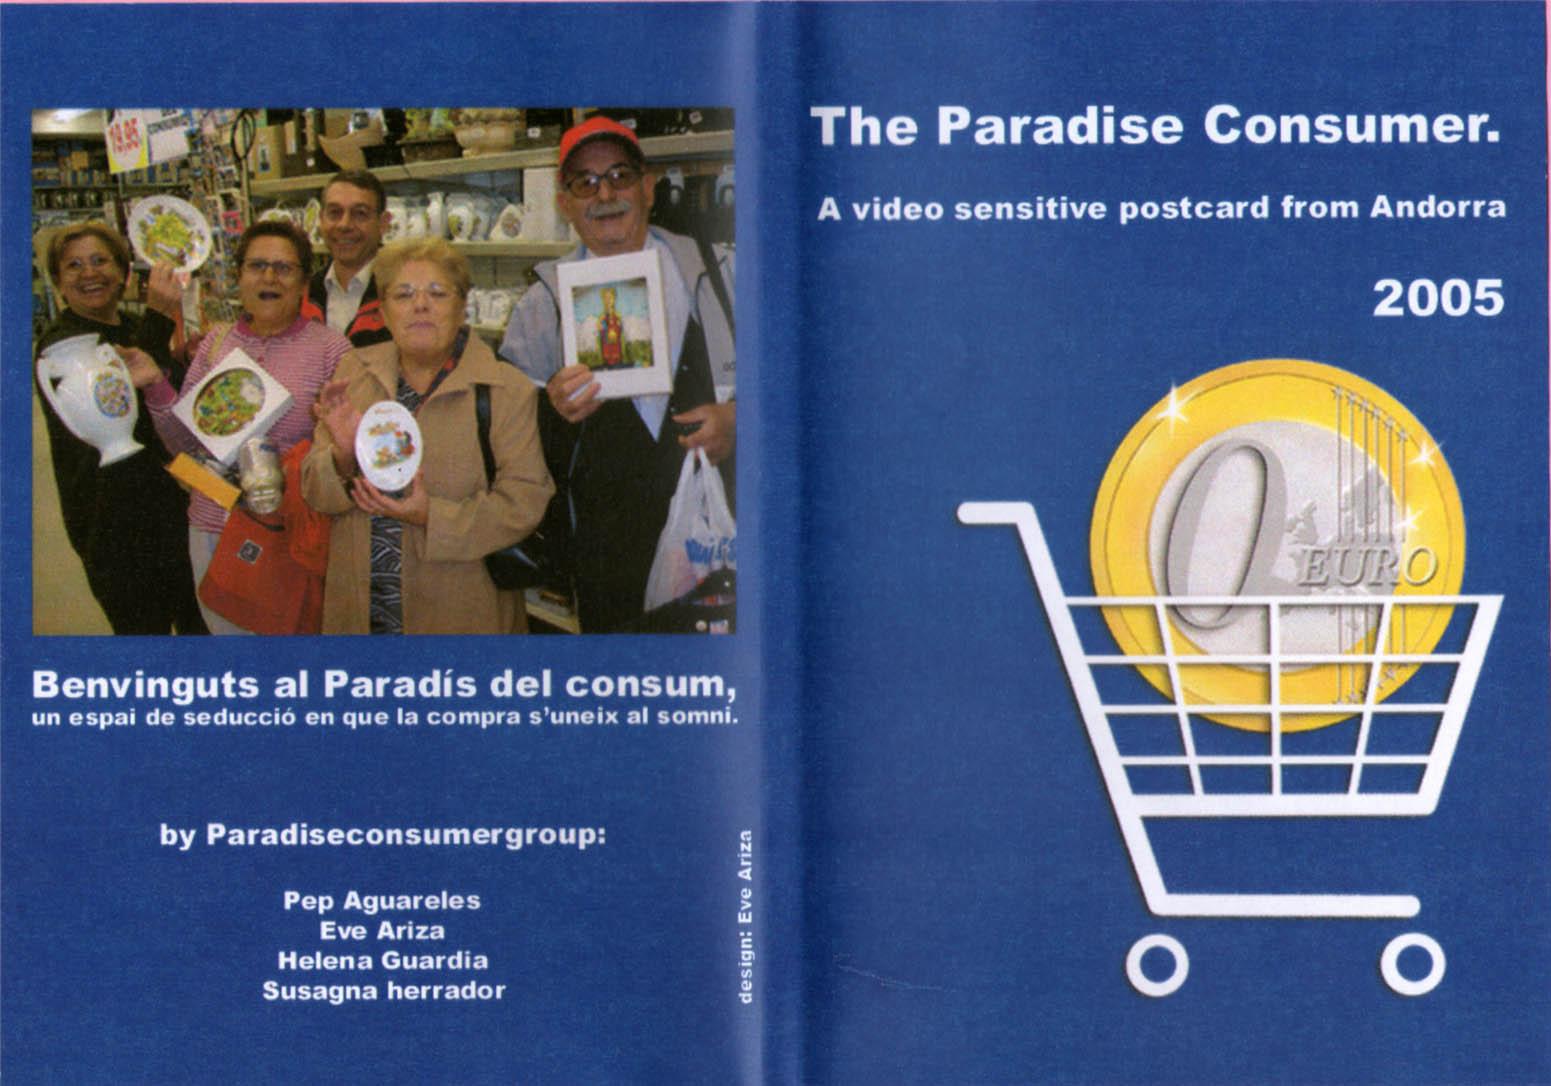 caratulaparadiseconsumervideosensitivepostcard